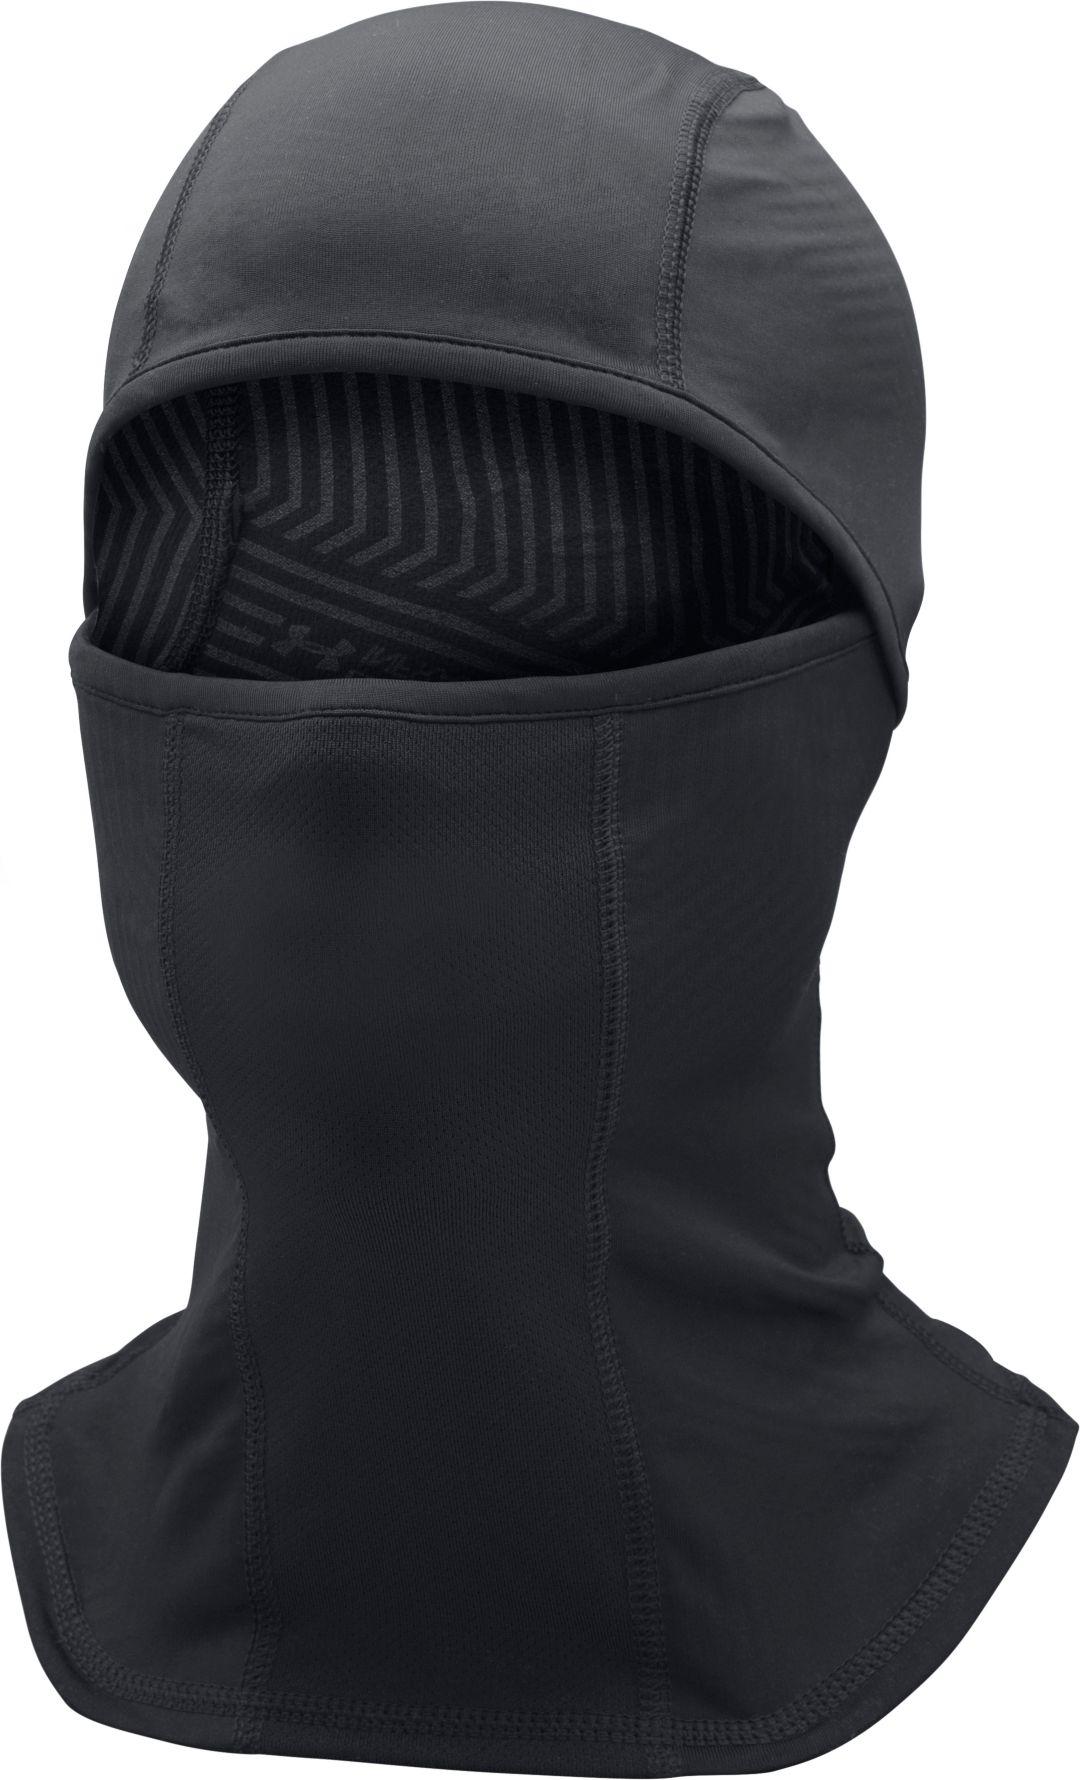 242d5c9f1c Under Armour Men's ColdGear Infrared Balaclava | DICK'S Sporting Goods